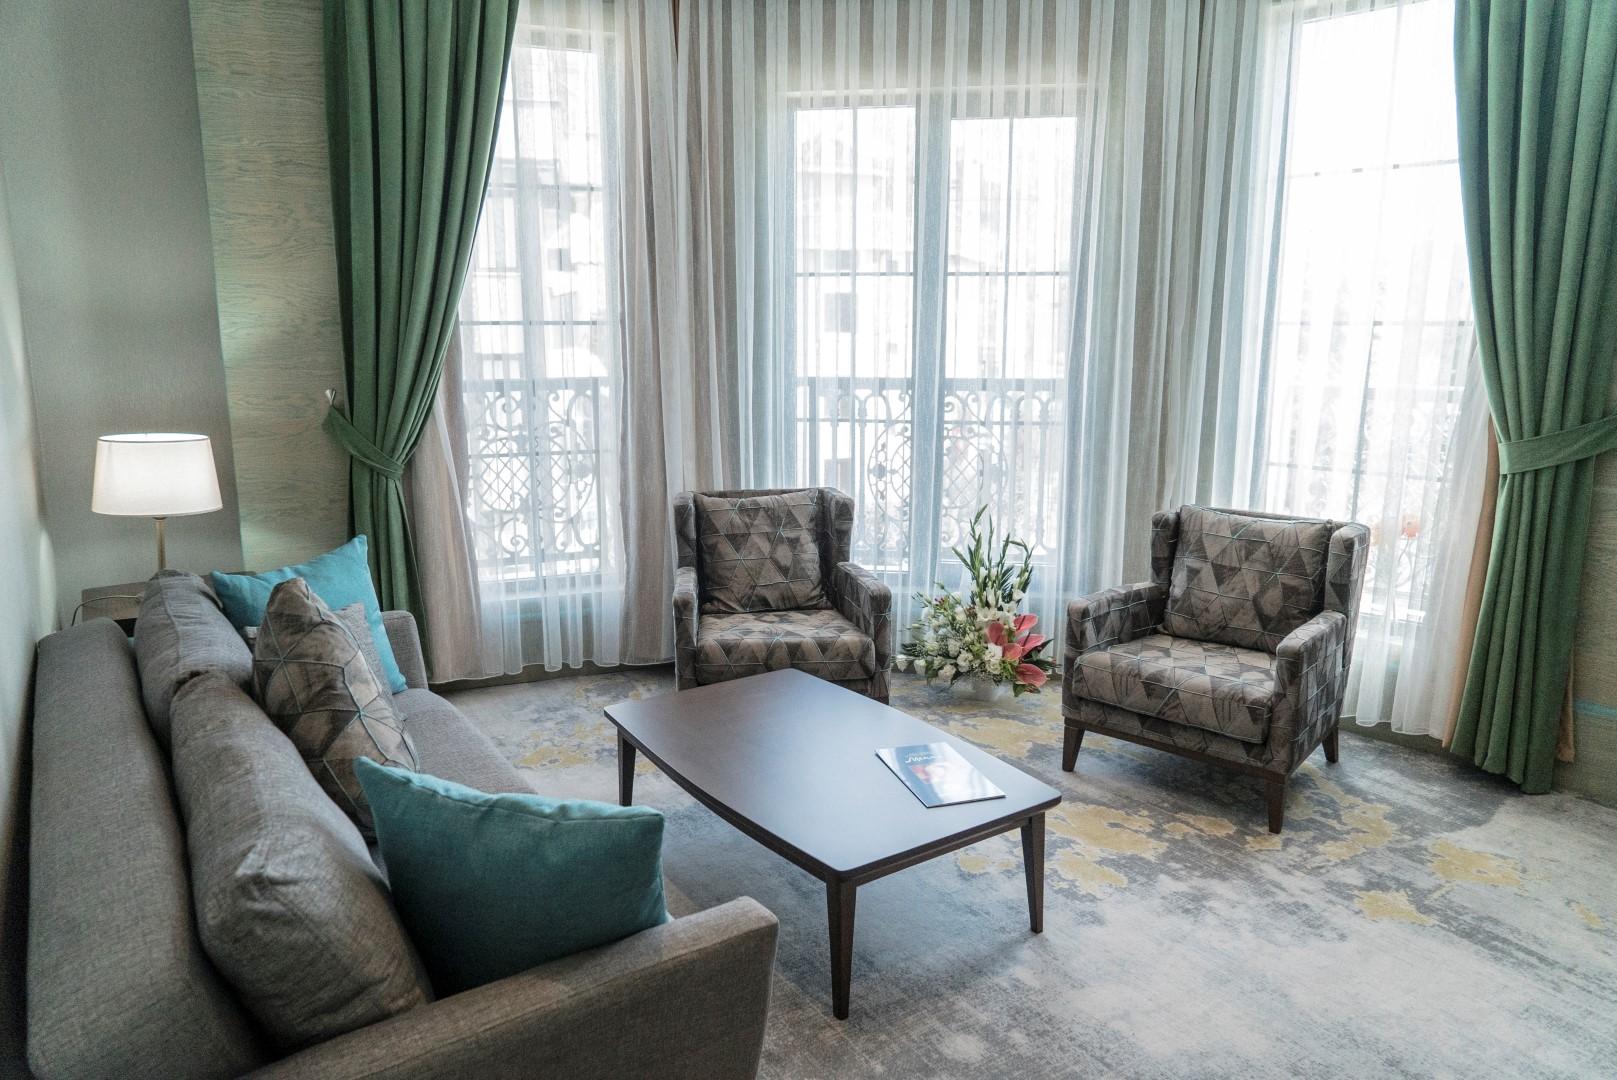 family-suite-aile-suiti (12)